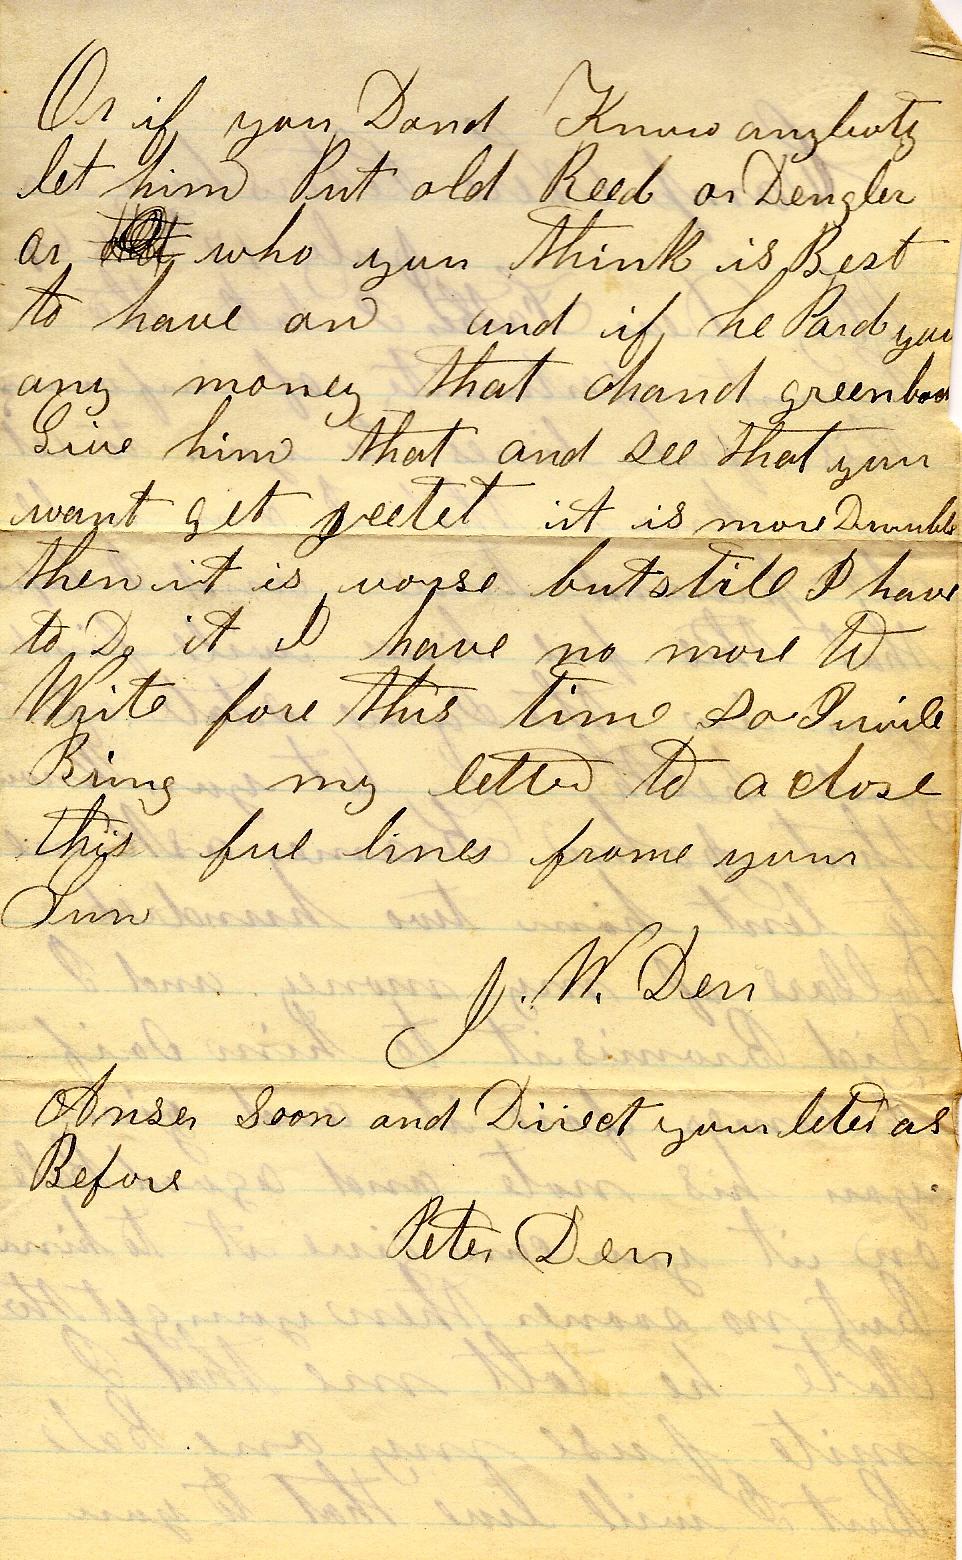 Civil War Letters of John W  Derr: June 2013